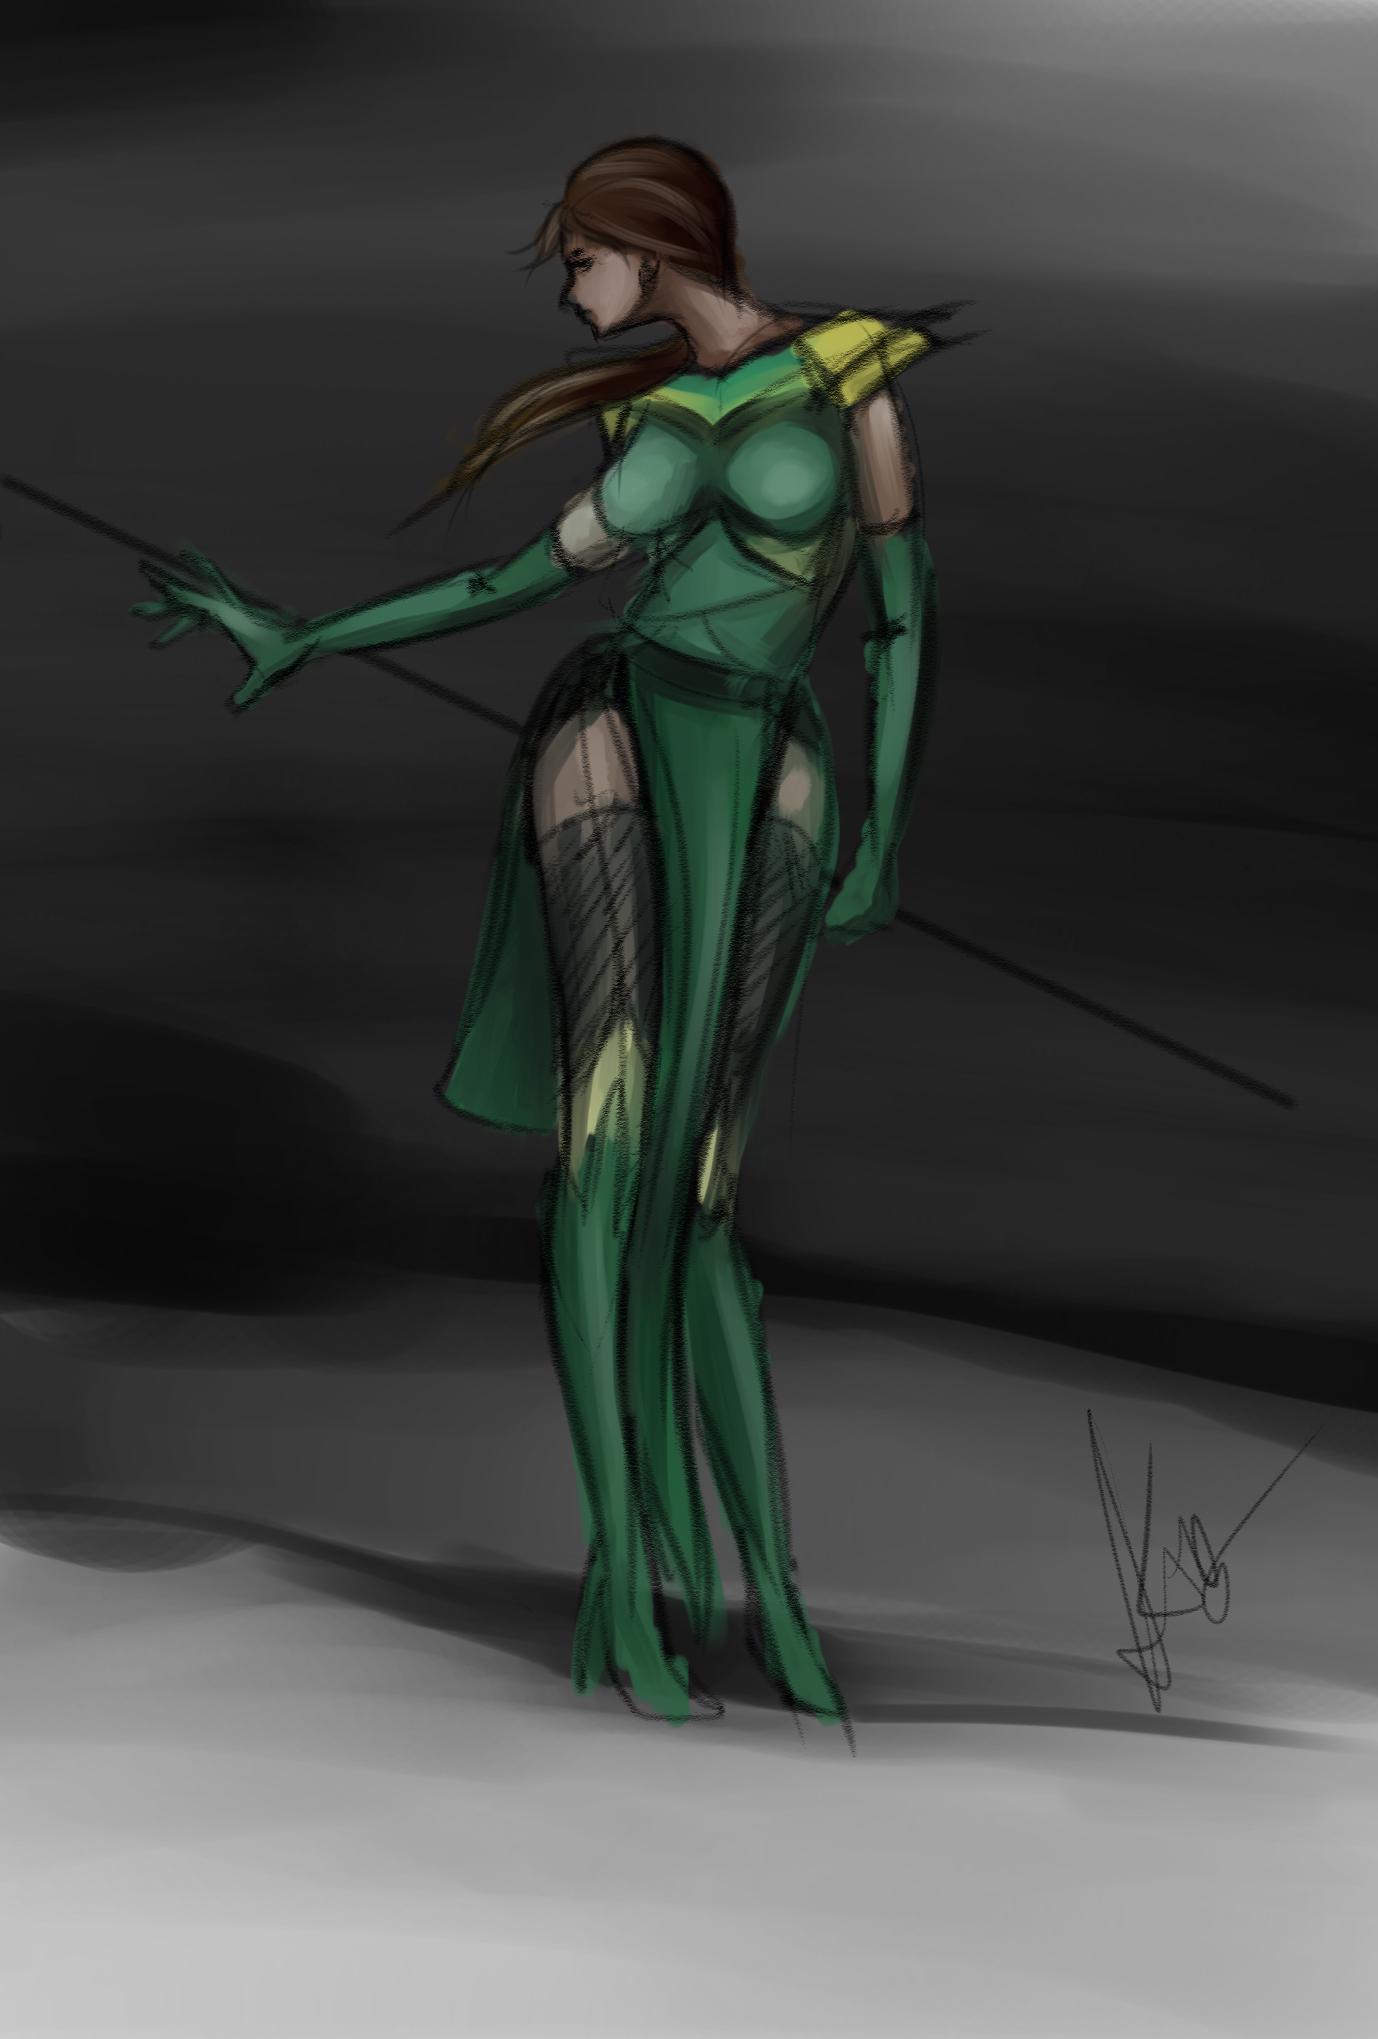 Quick sketch for Jade